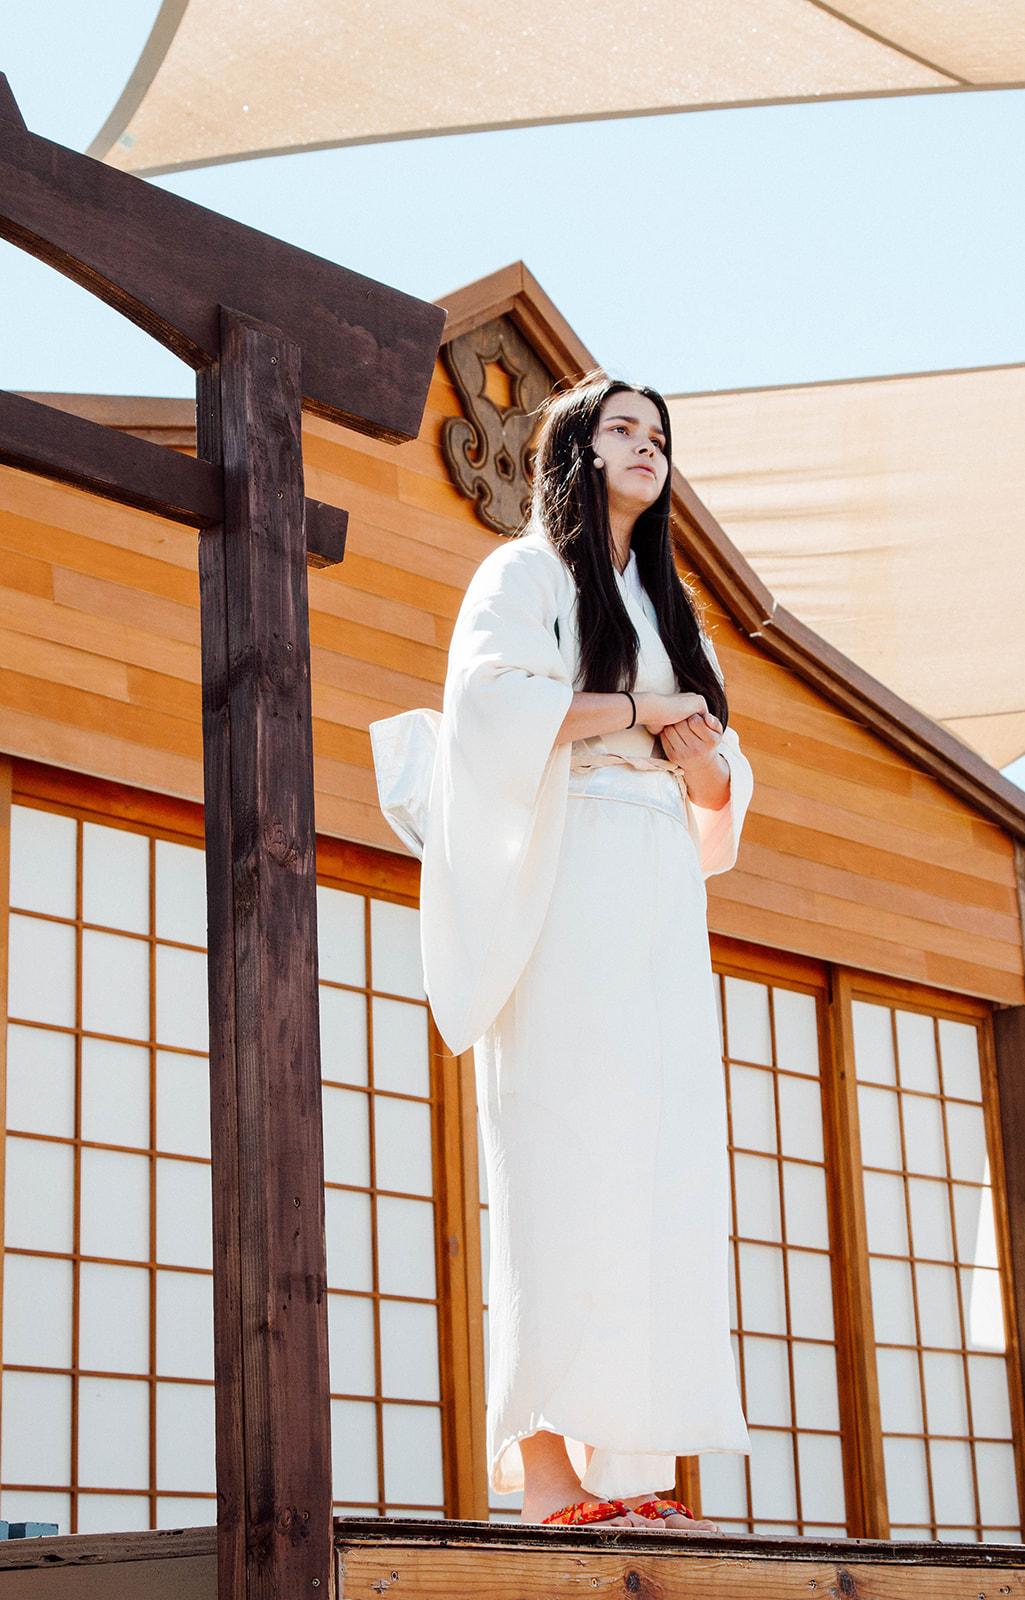 Wakamatsu_Festival_2019_028_websize.jpg